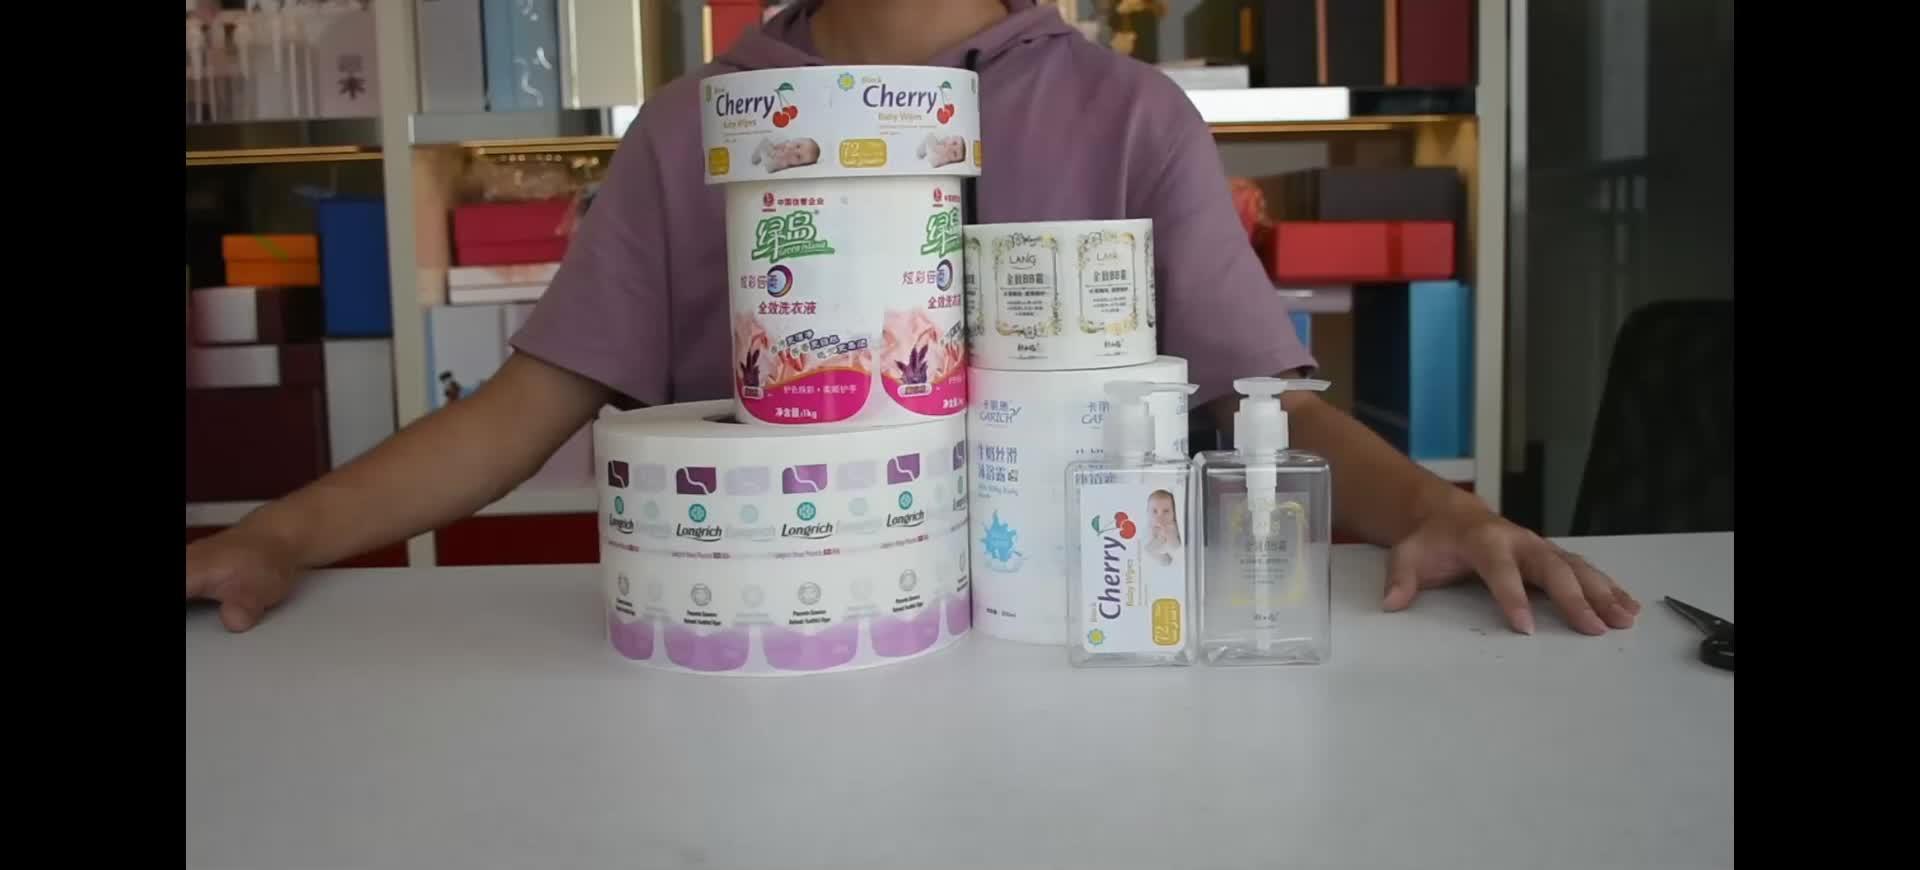 Individuell Bedruckte Massage Creme Make-Up Private Label Hautpflege Körper Lotion Kosmetik Jar Etiketten Aufkleber